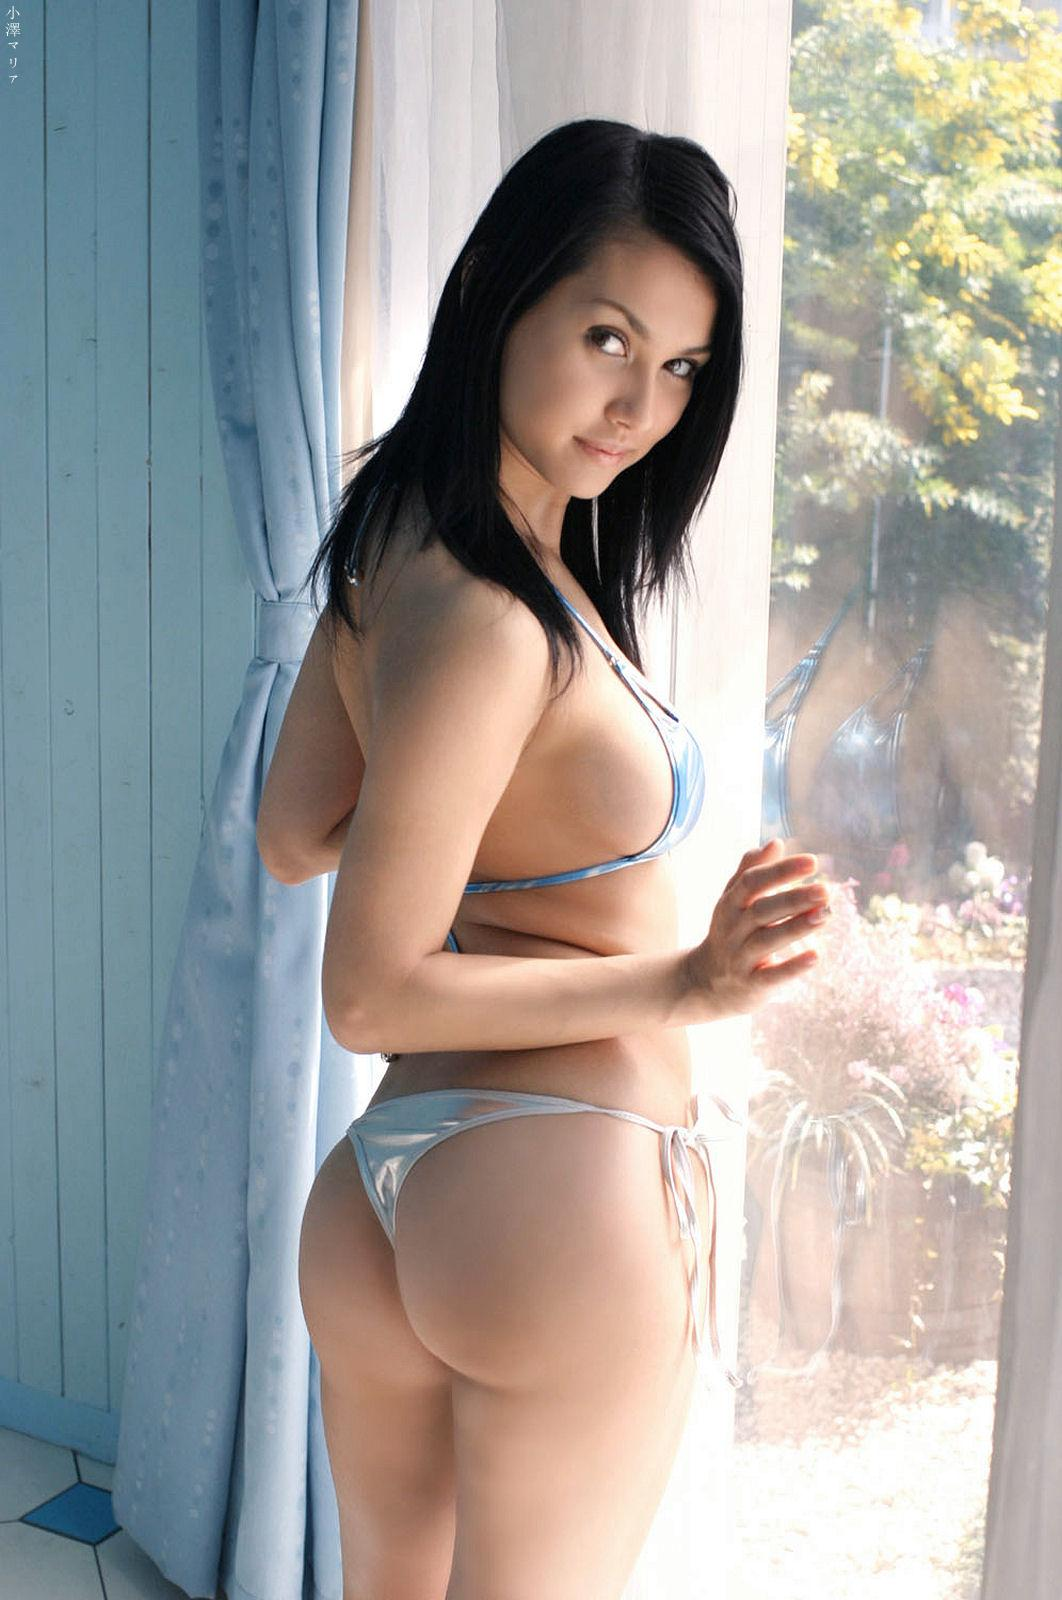 maria is so hot in this tiny little blue bikini maria